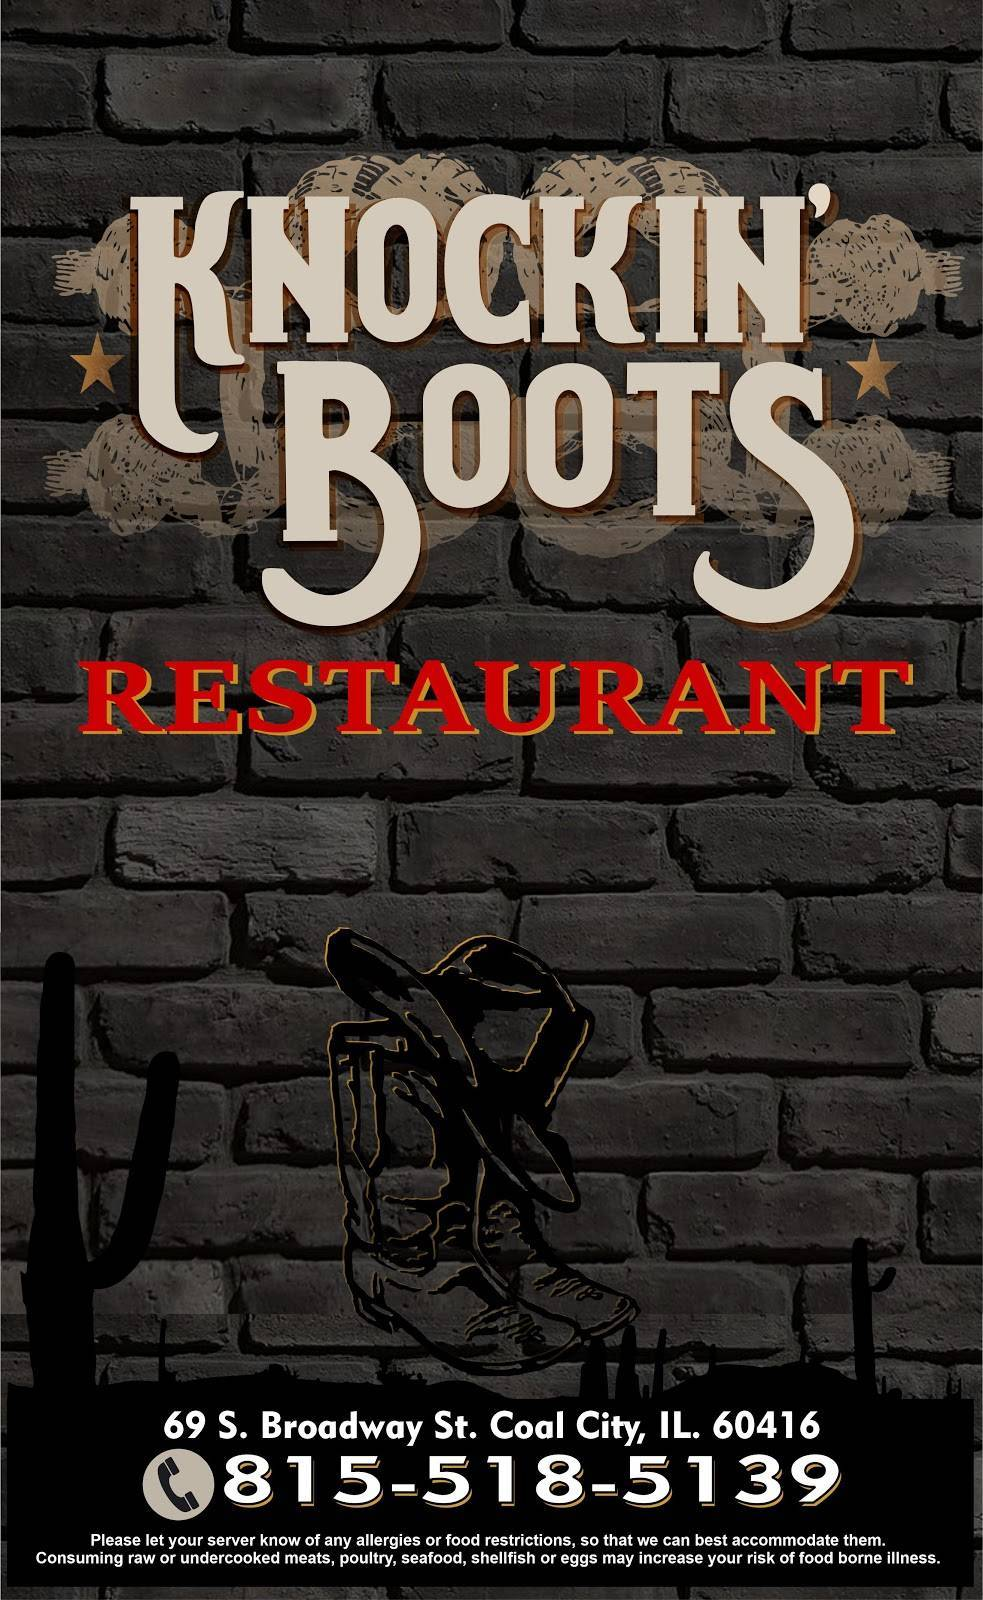 Knockin Boots Restaurant | restaurant | 69 S Broadway St, Coal City, IL 60416, USA | 8155185139 OR +1 815-518-5139